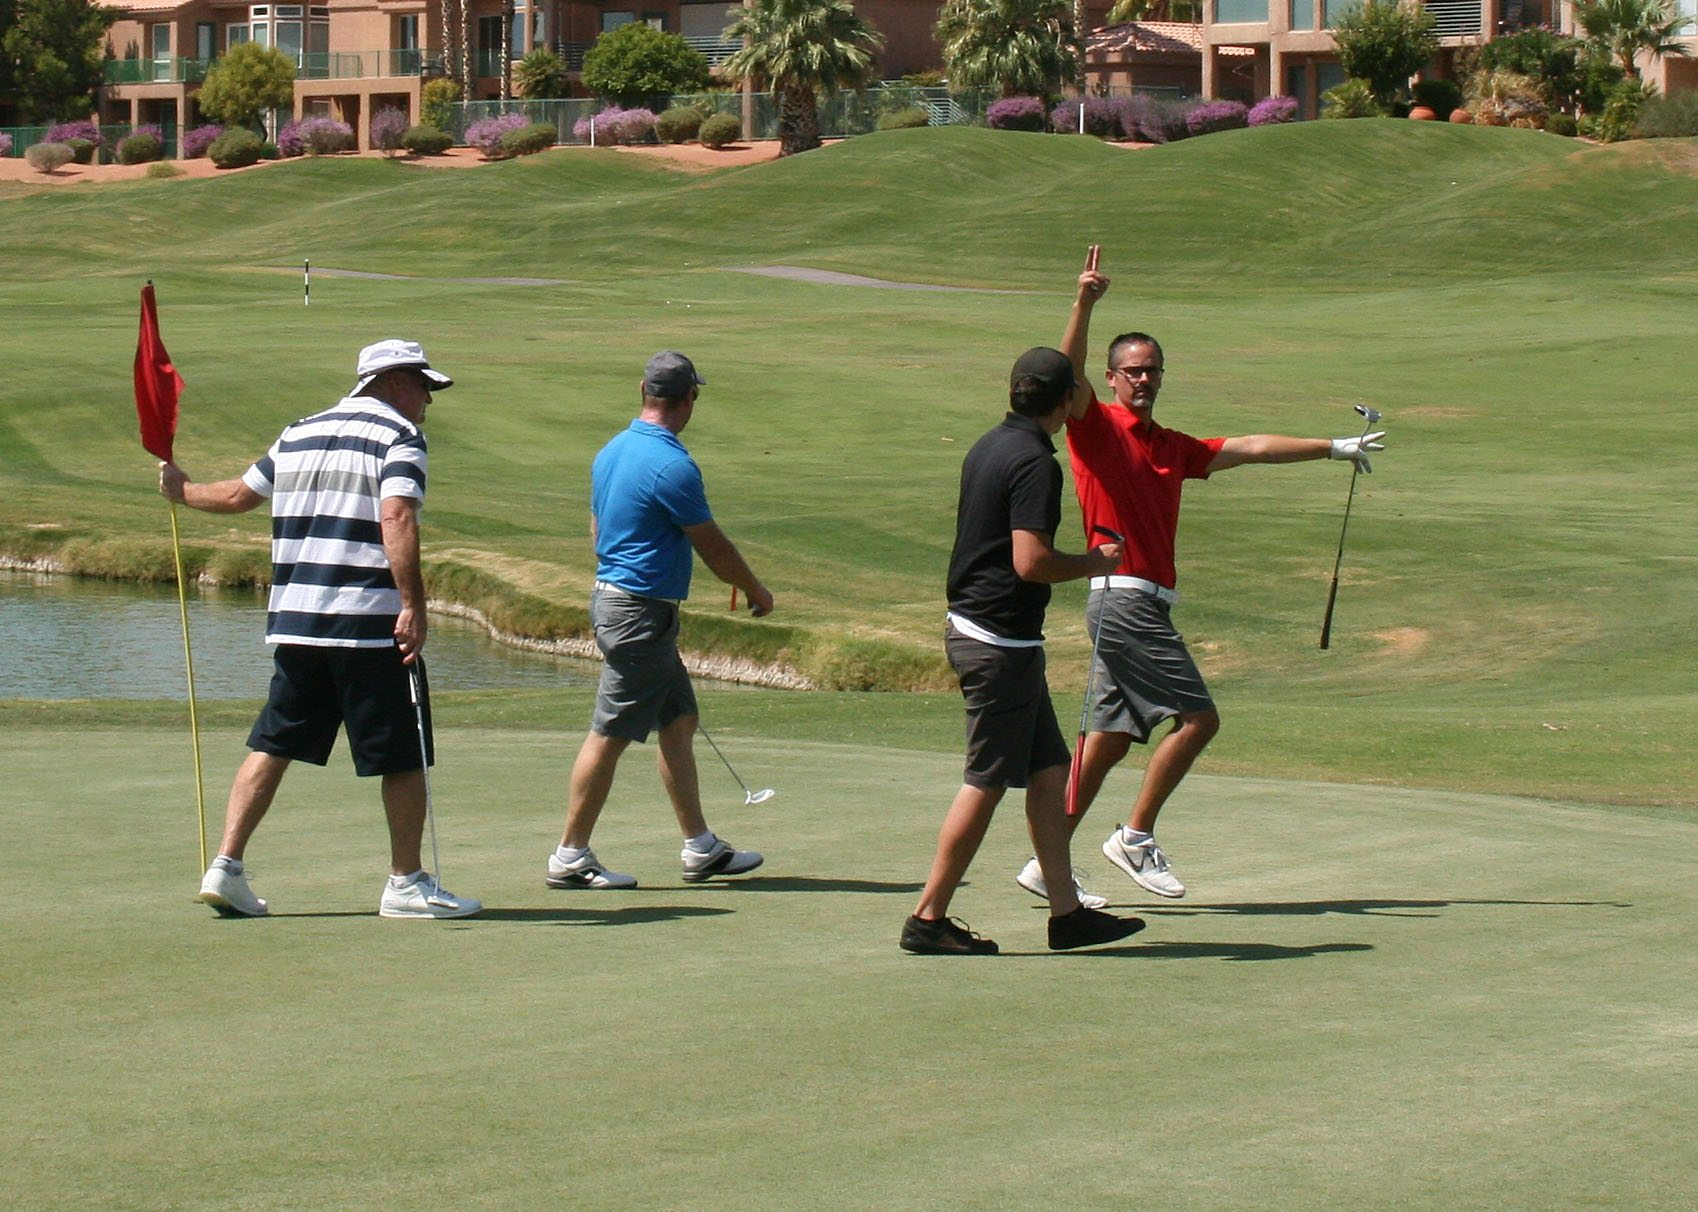 Chamber hosts 12th annual golf tournament fundraiser